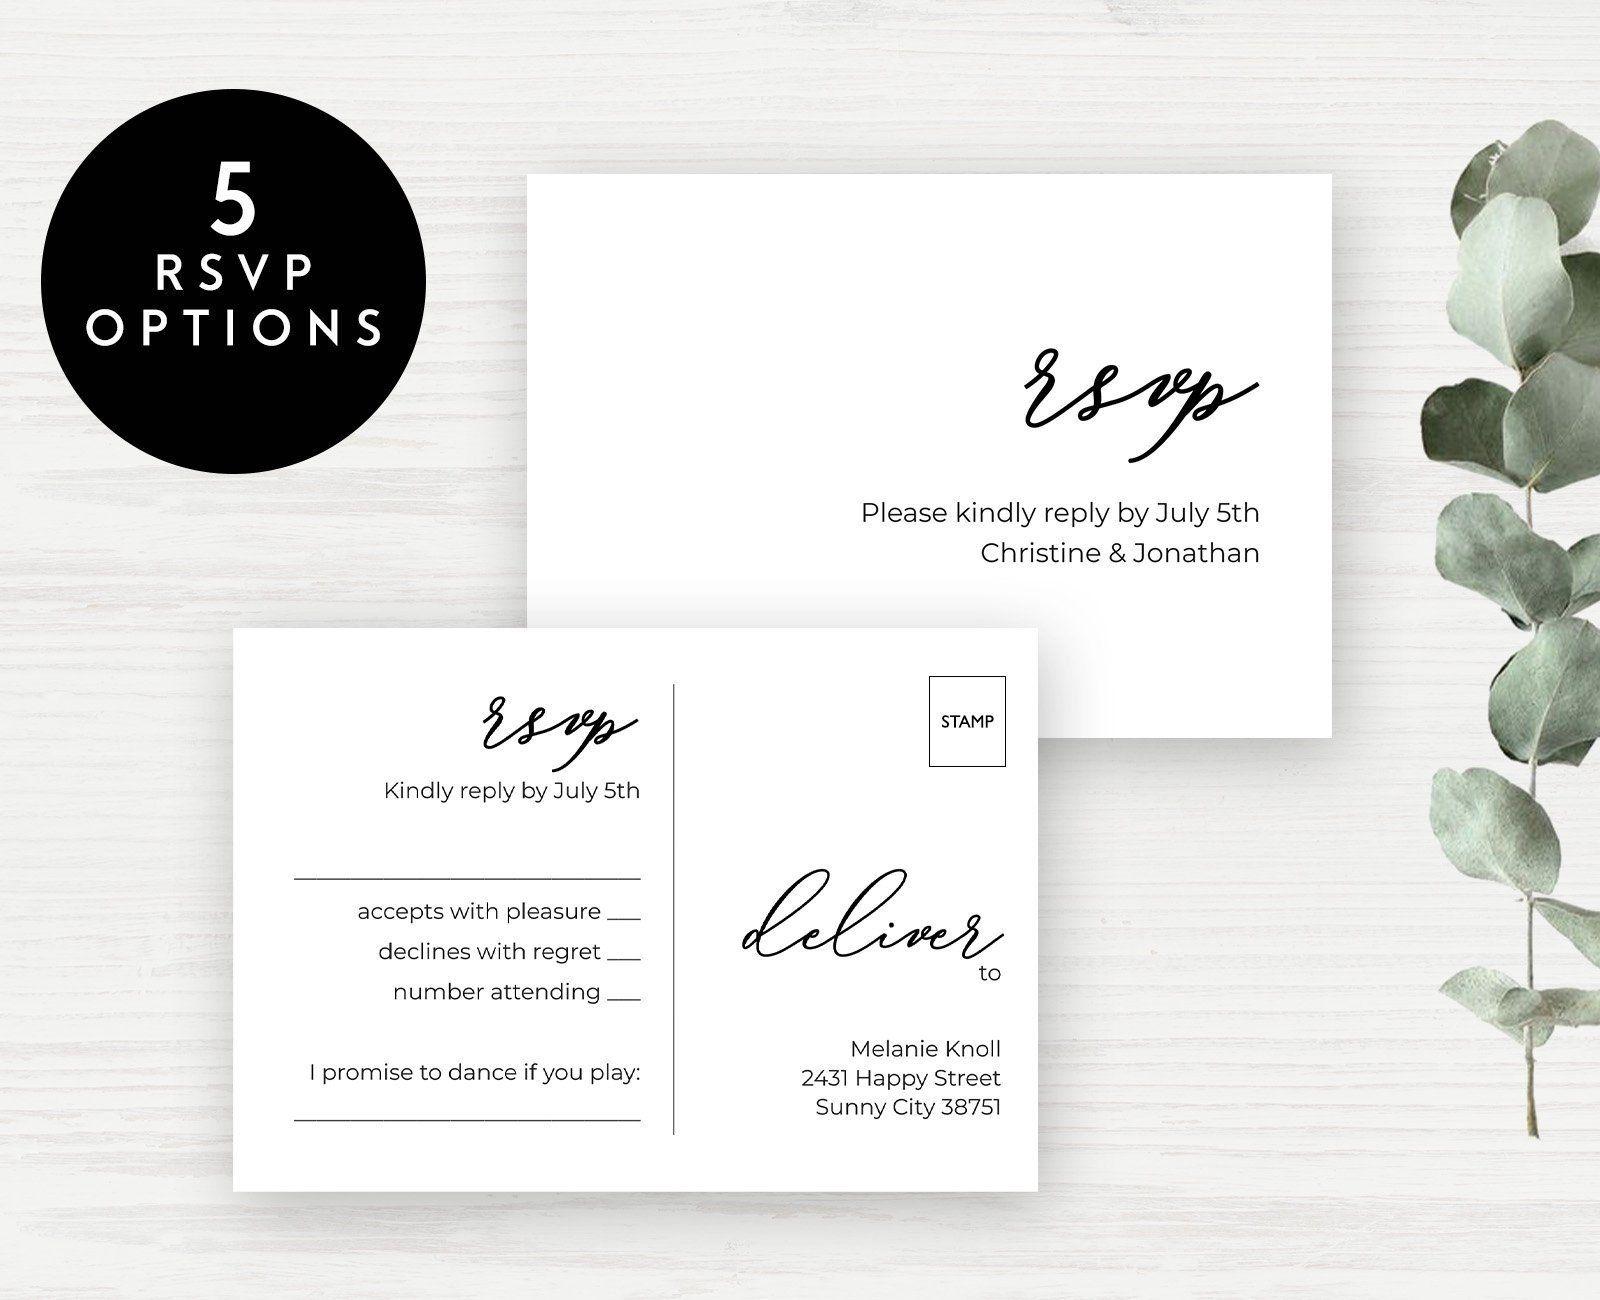 Printable Wedding Rsvp Card Template Wedding Rsvp Postcard Editable Wedding Response Card Ki Wedding Rsvp Postcard Wedding Response Cards Rsvp Wedding Cards